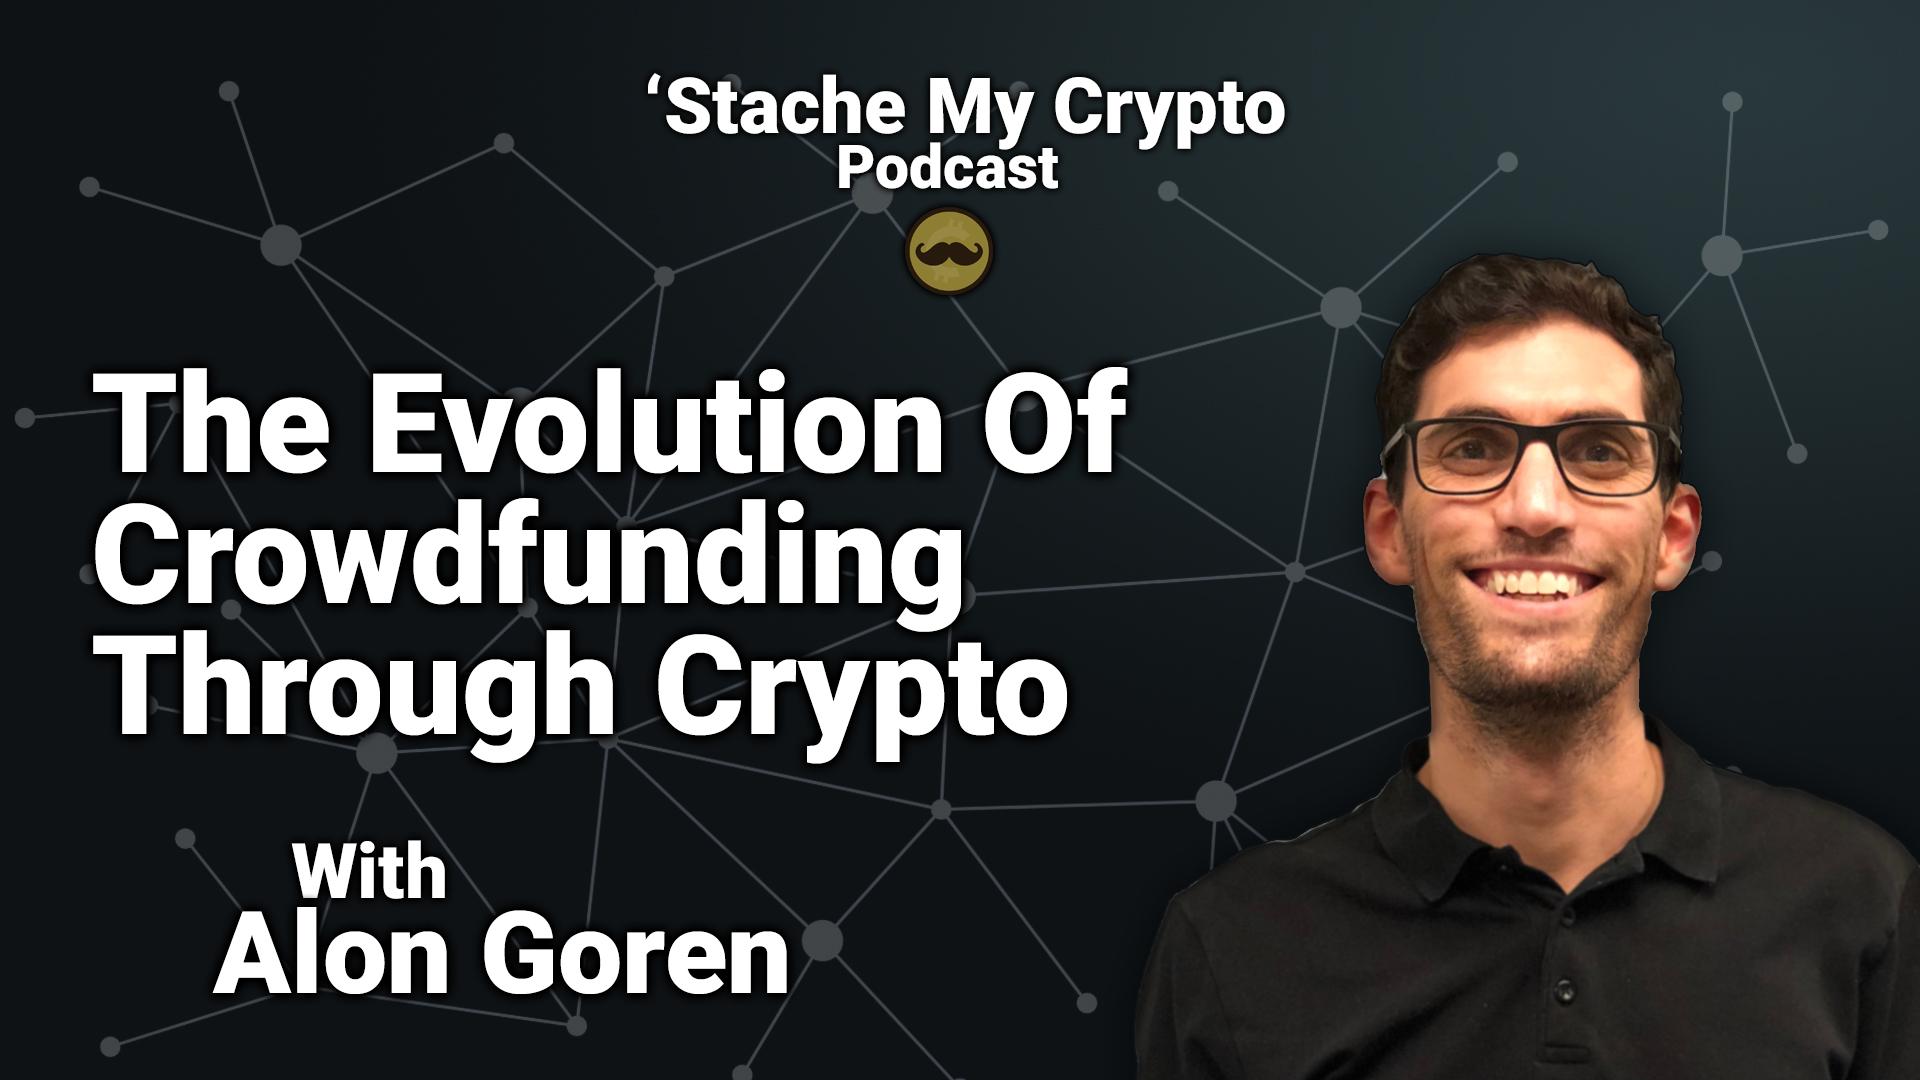 'Stache My Crypto Podcast with Alon Goren